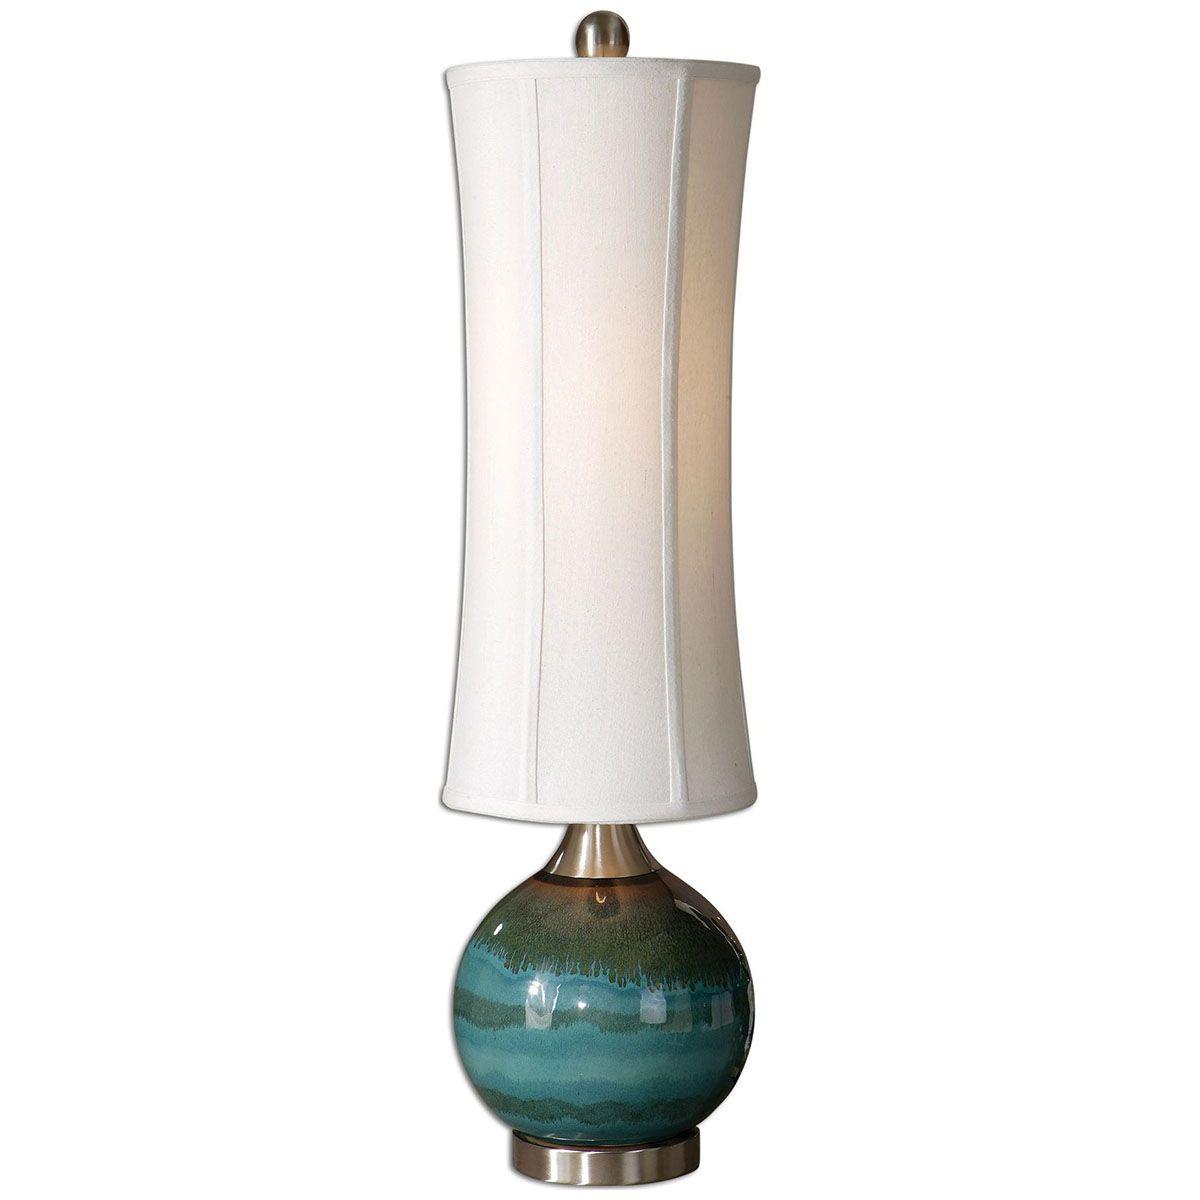 Uttermost Atherton Blue Buffet Lamp 29287-1